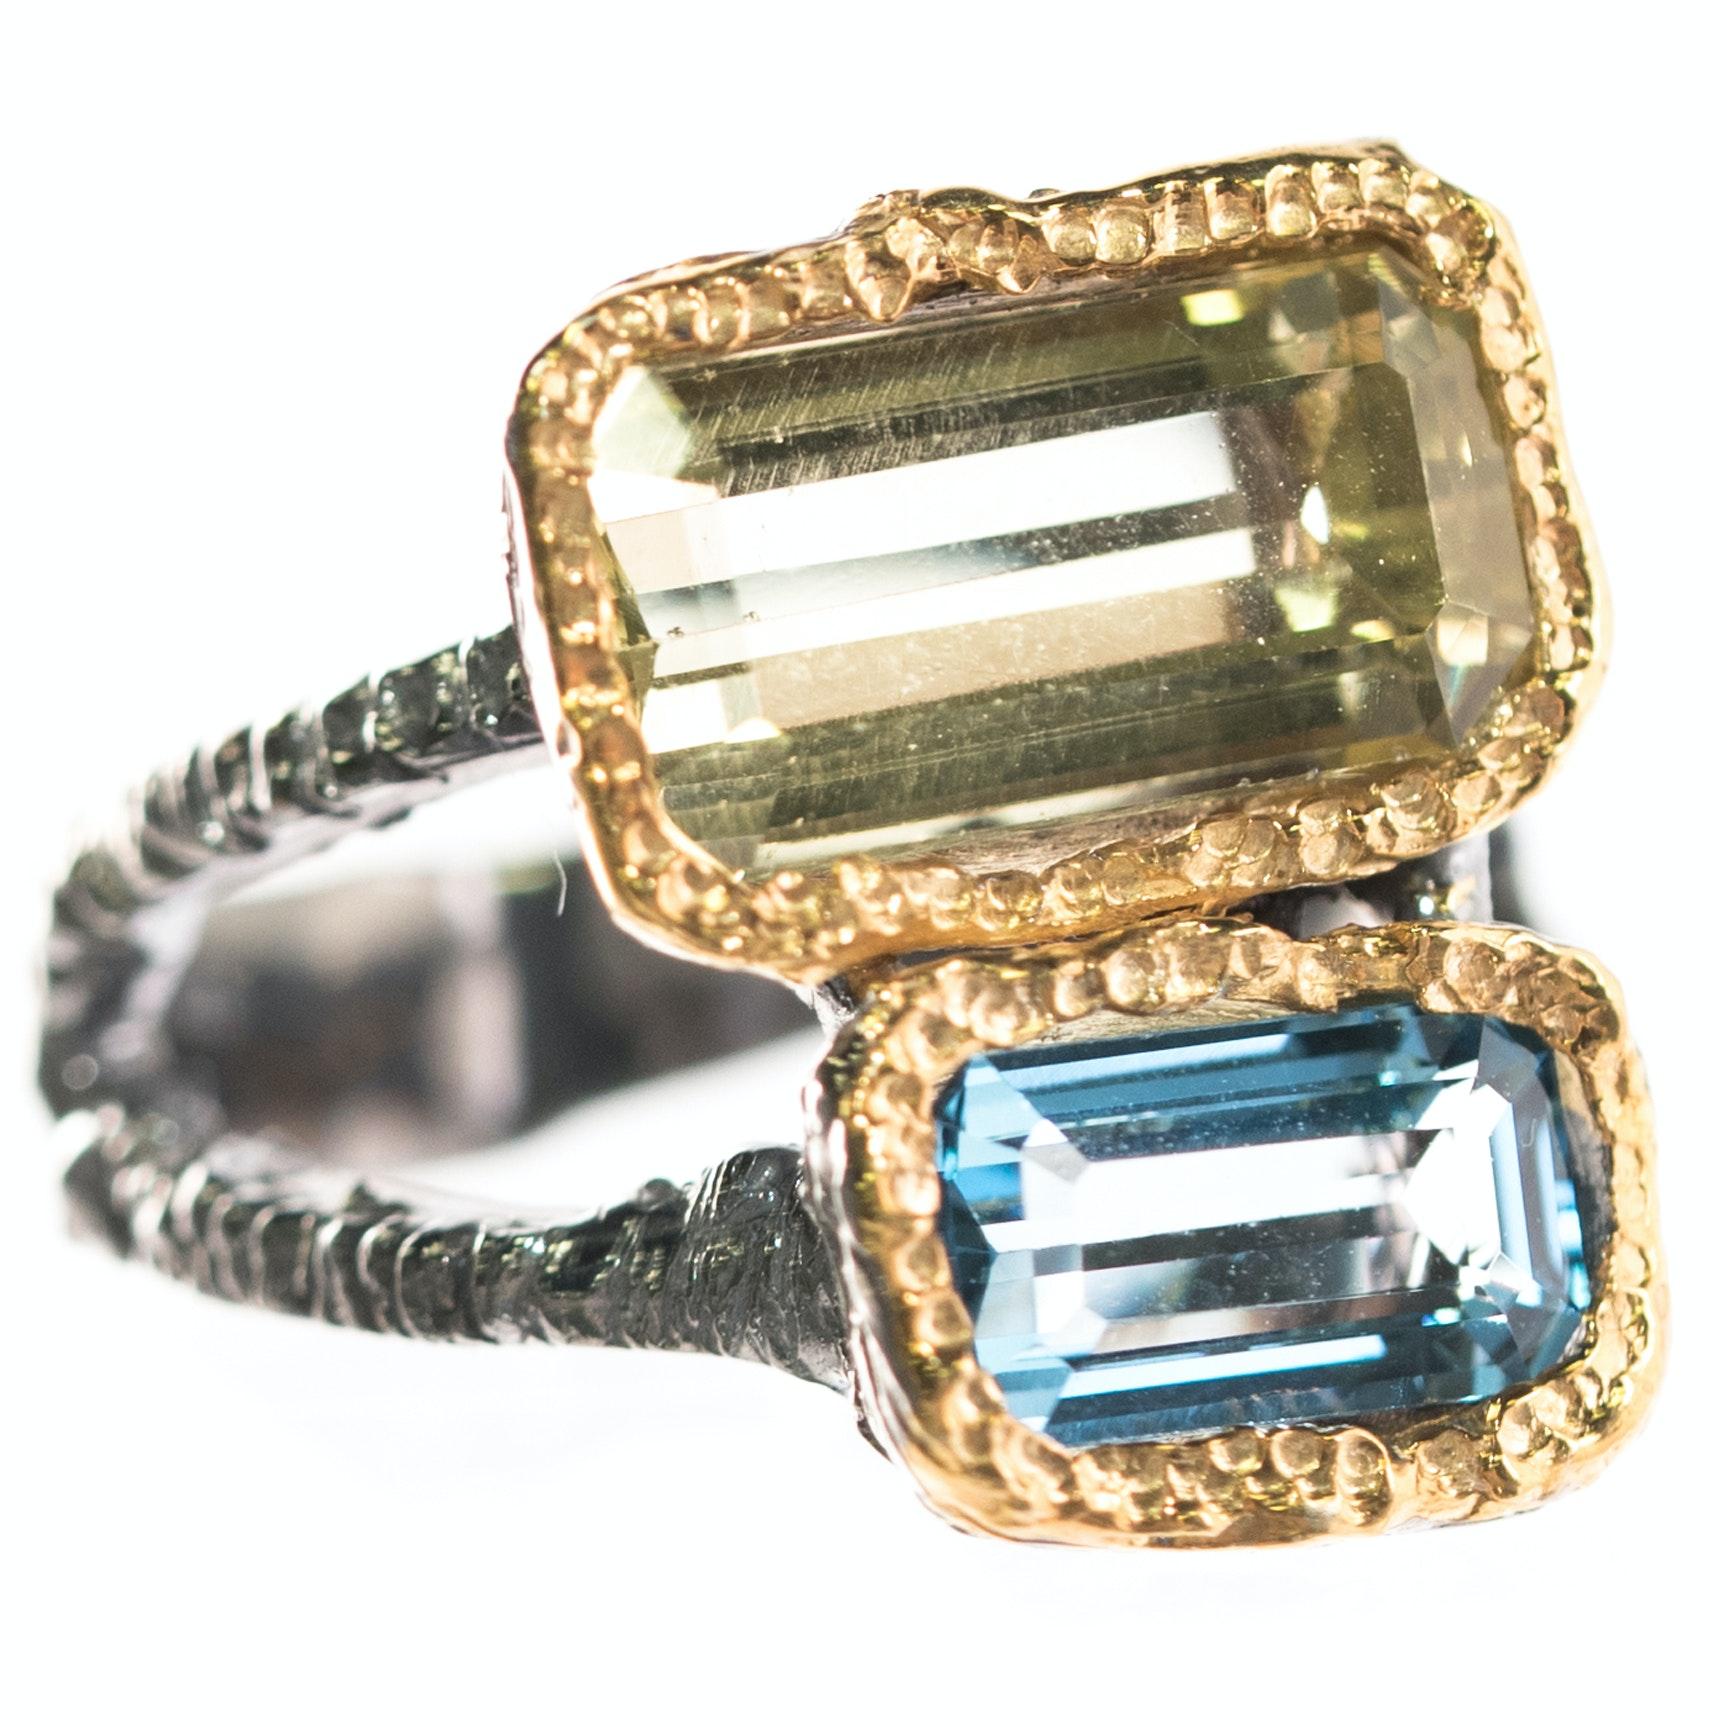 Oxidized Sterling Silver, 3.66 CT Lemon Quartz, and 1.73 CT Blue Topaz Ring